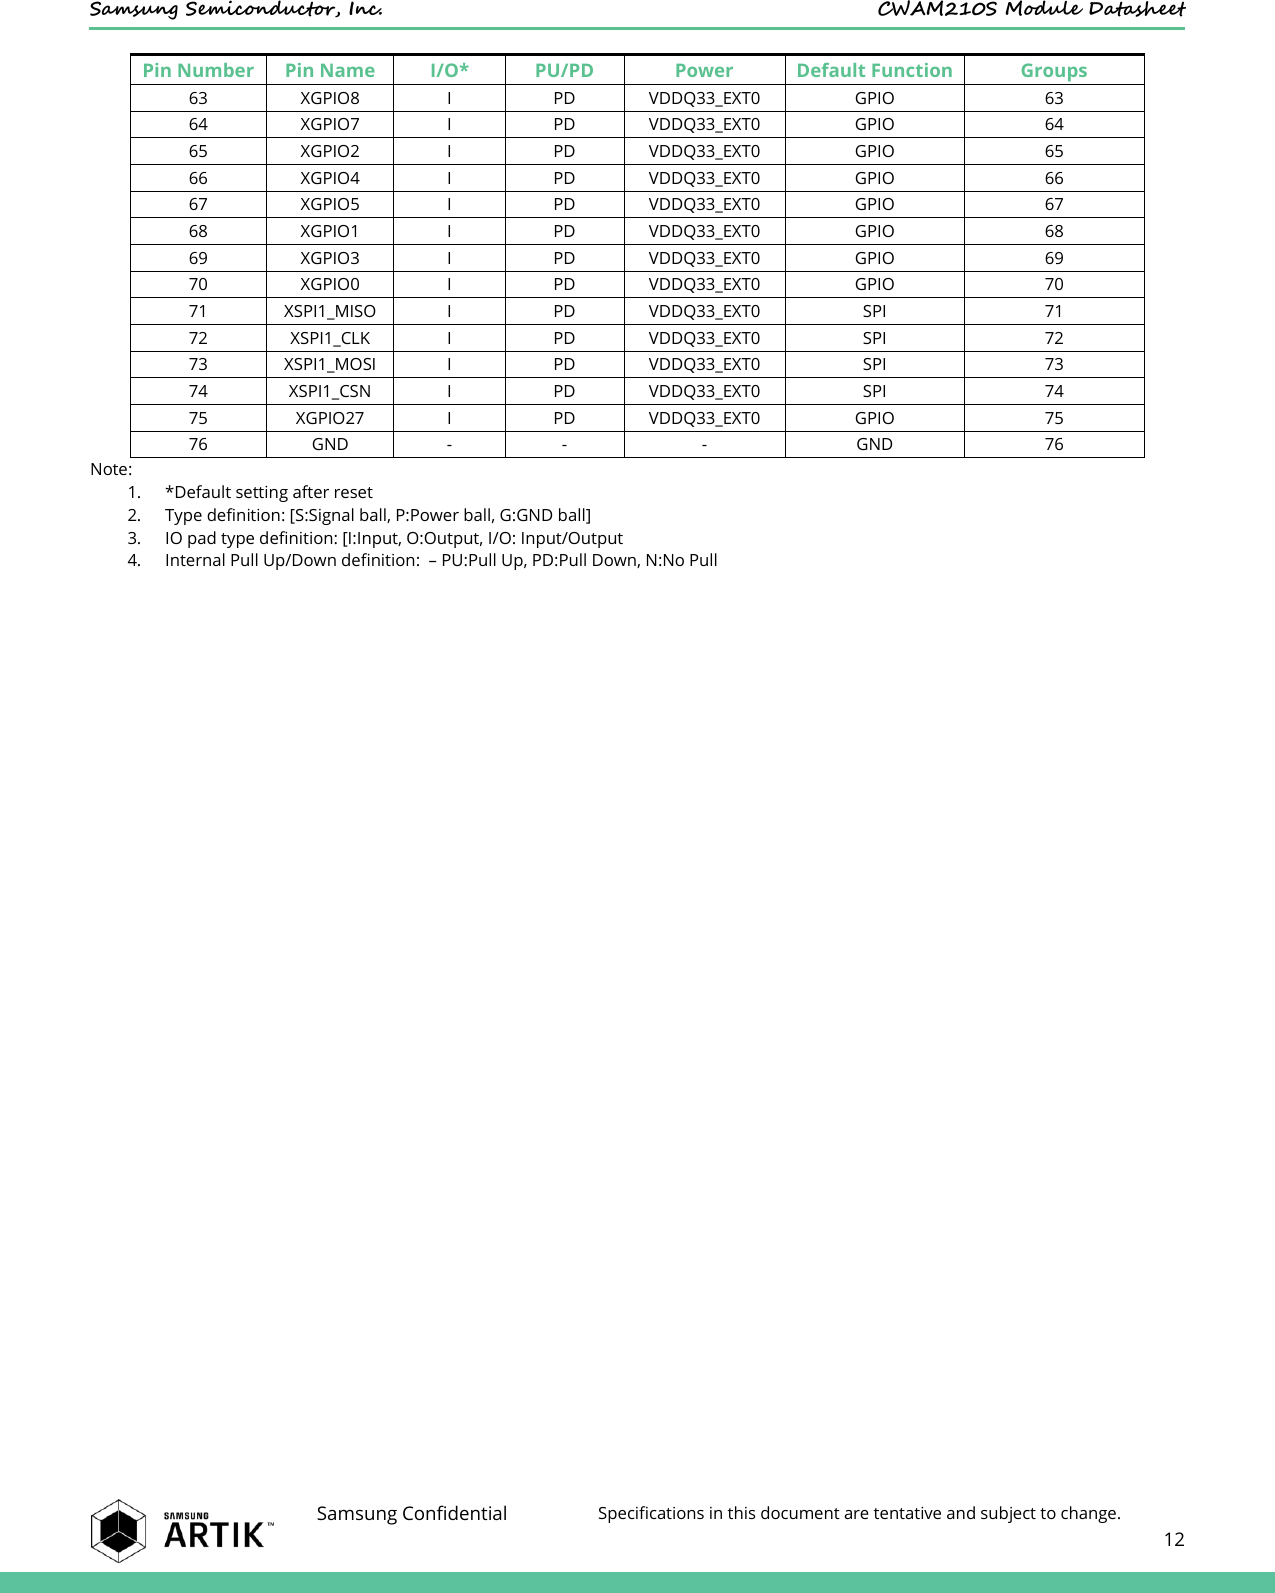 Samsung Electronics Co CWAM210S IOT Module User Manual